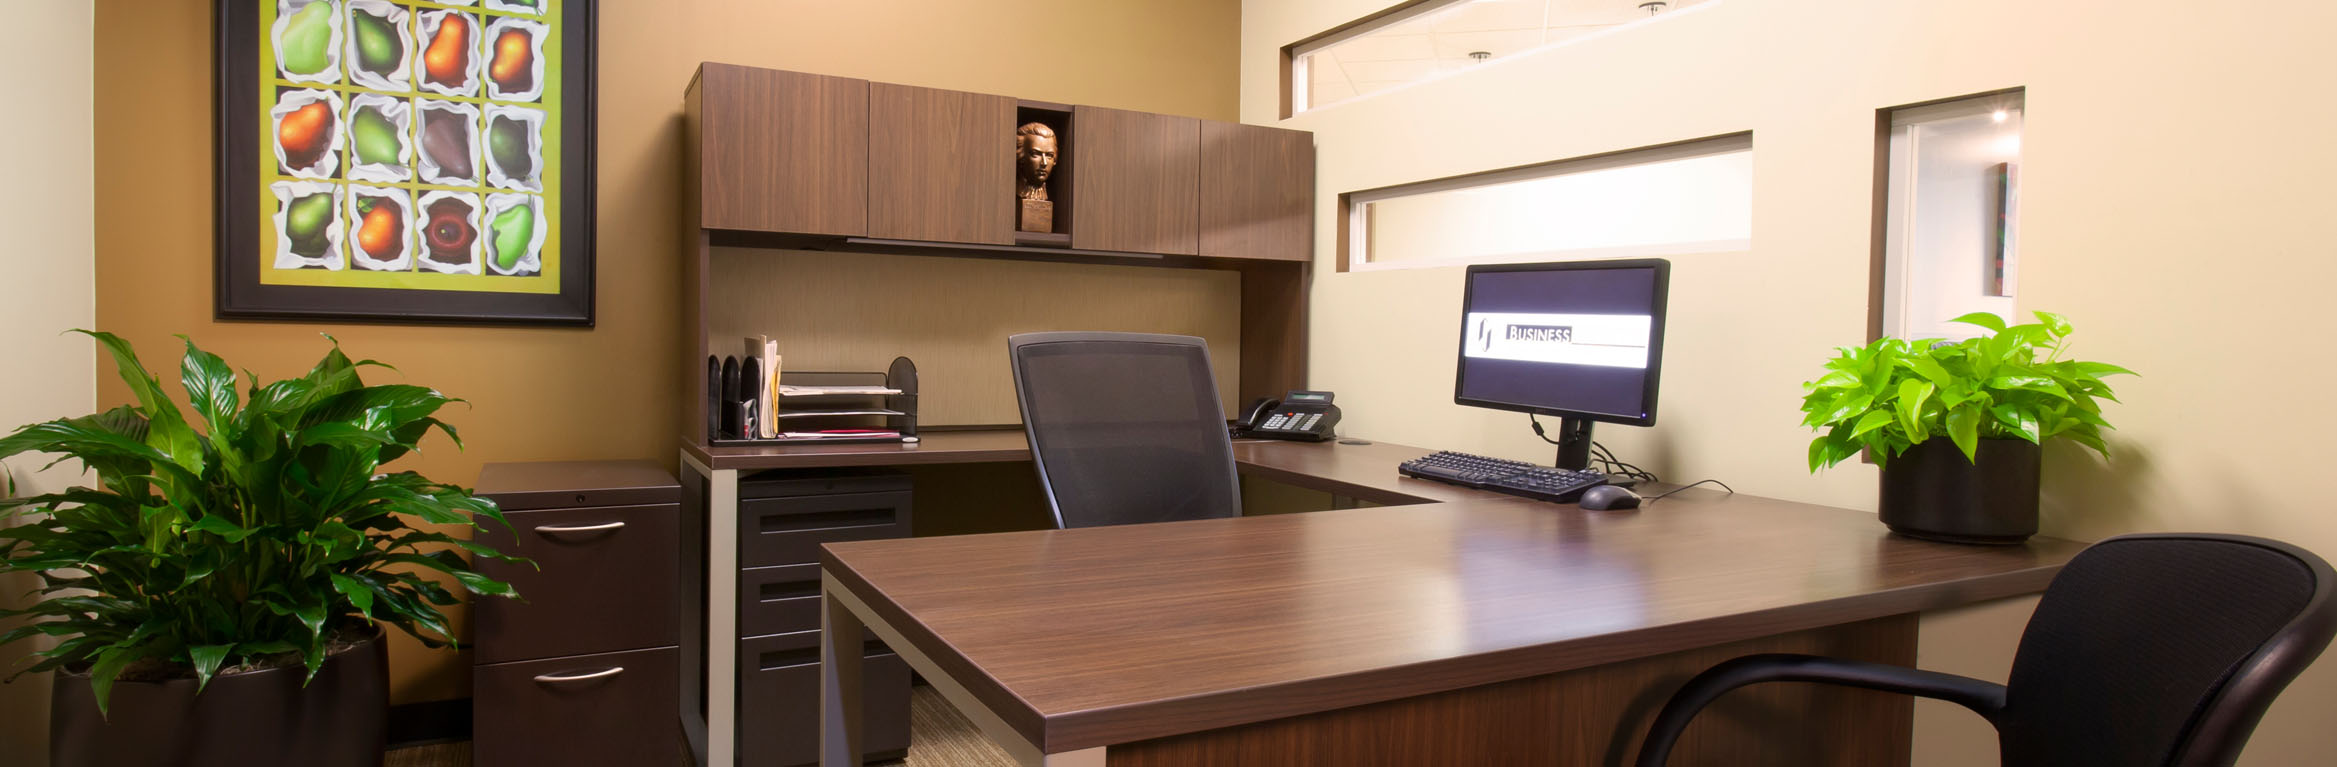 Temporary office space in Sacramento